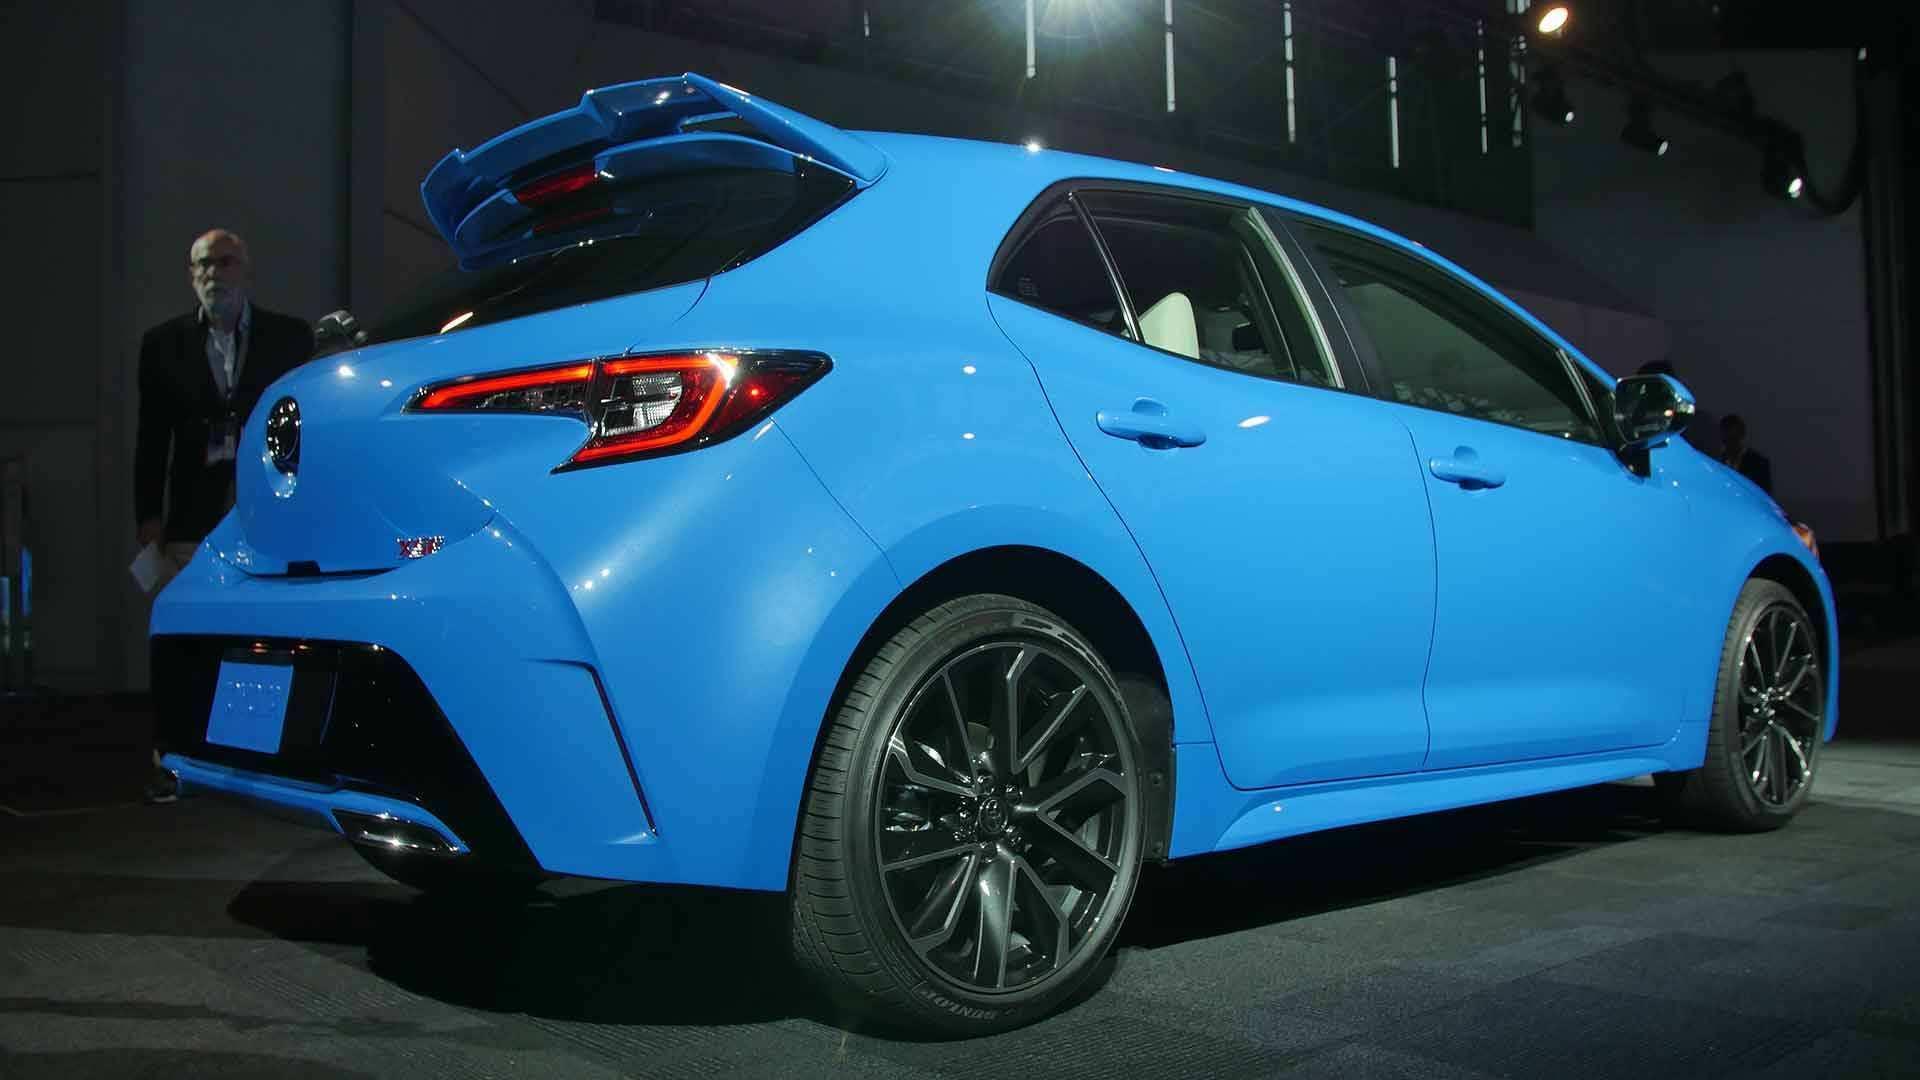 65 Best Review Toyota Hatchback 2019 Specs for Toyota Hatchback 2019